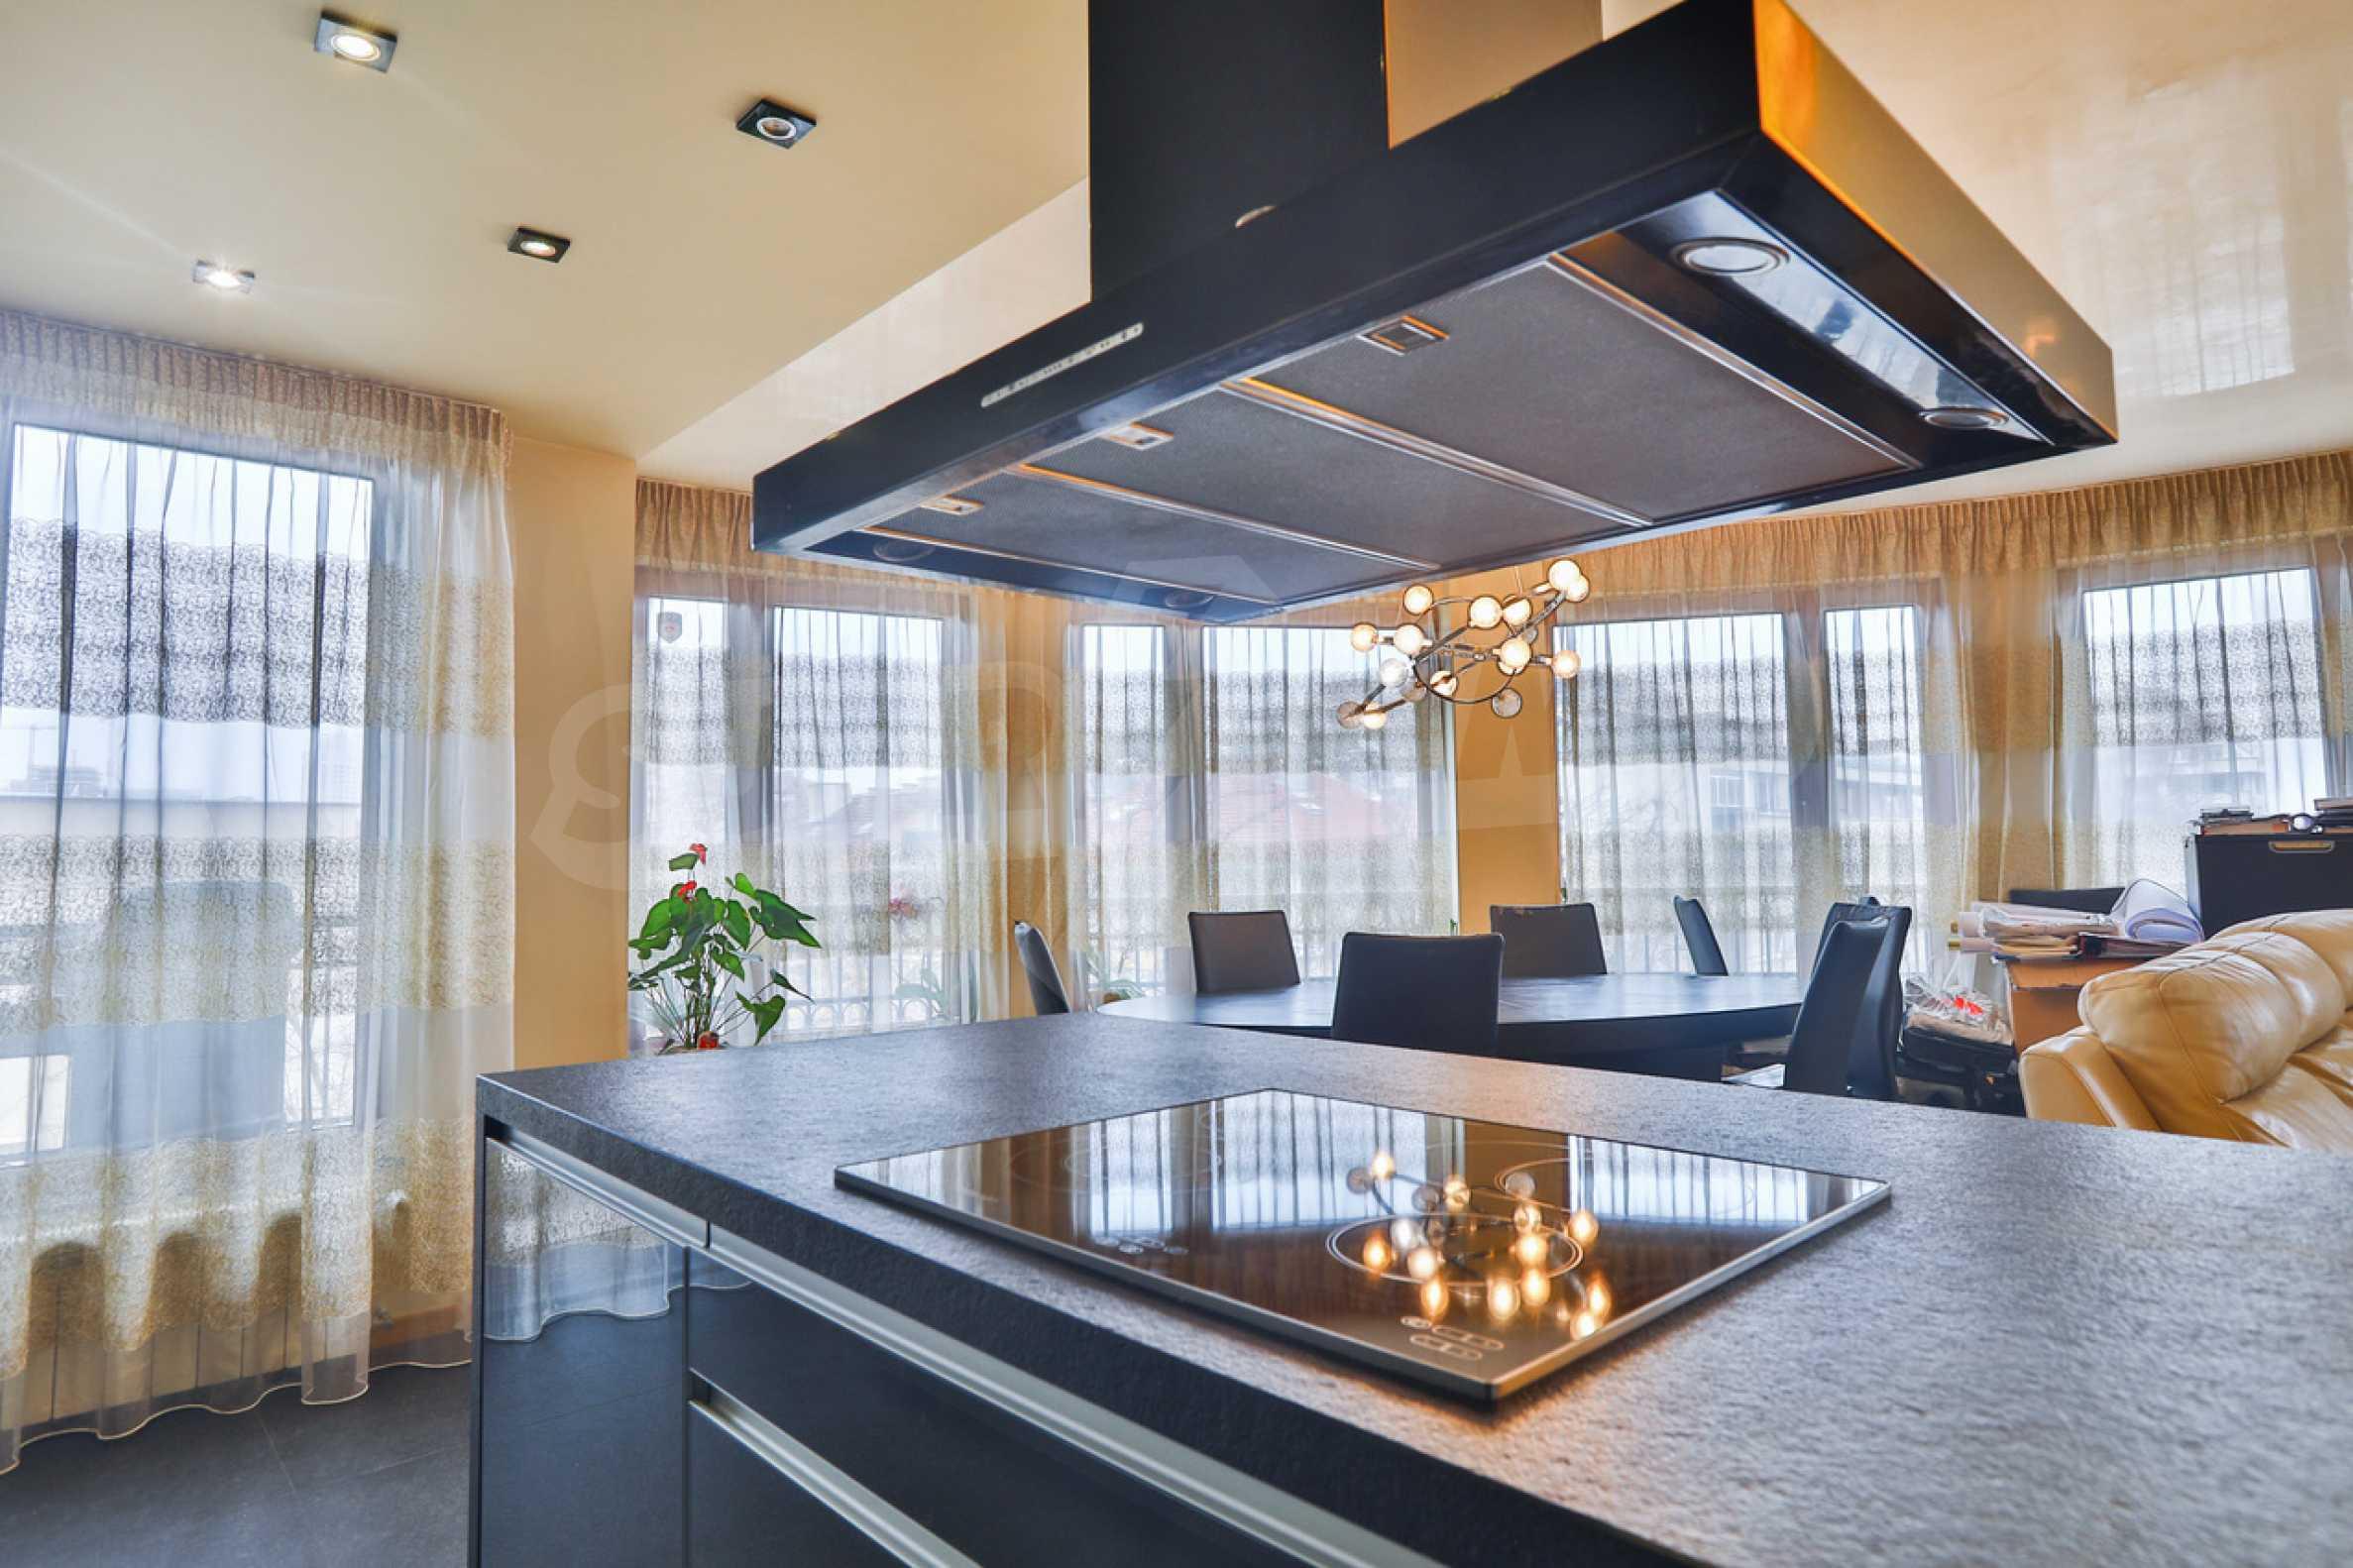 2-bedroom apartment in Sofia 7